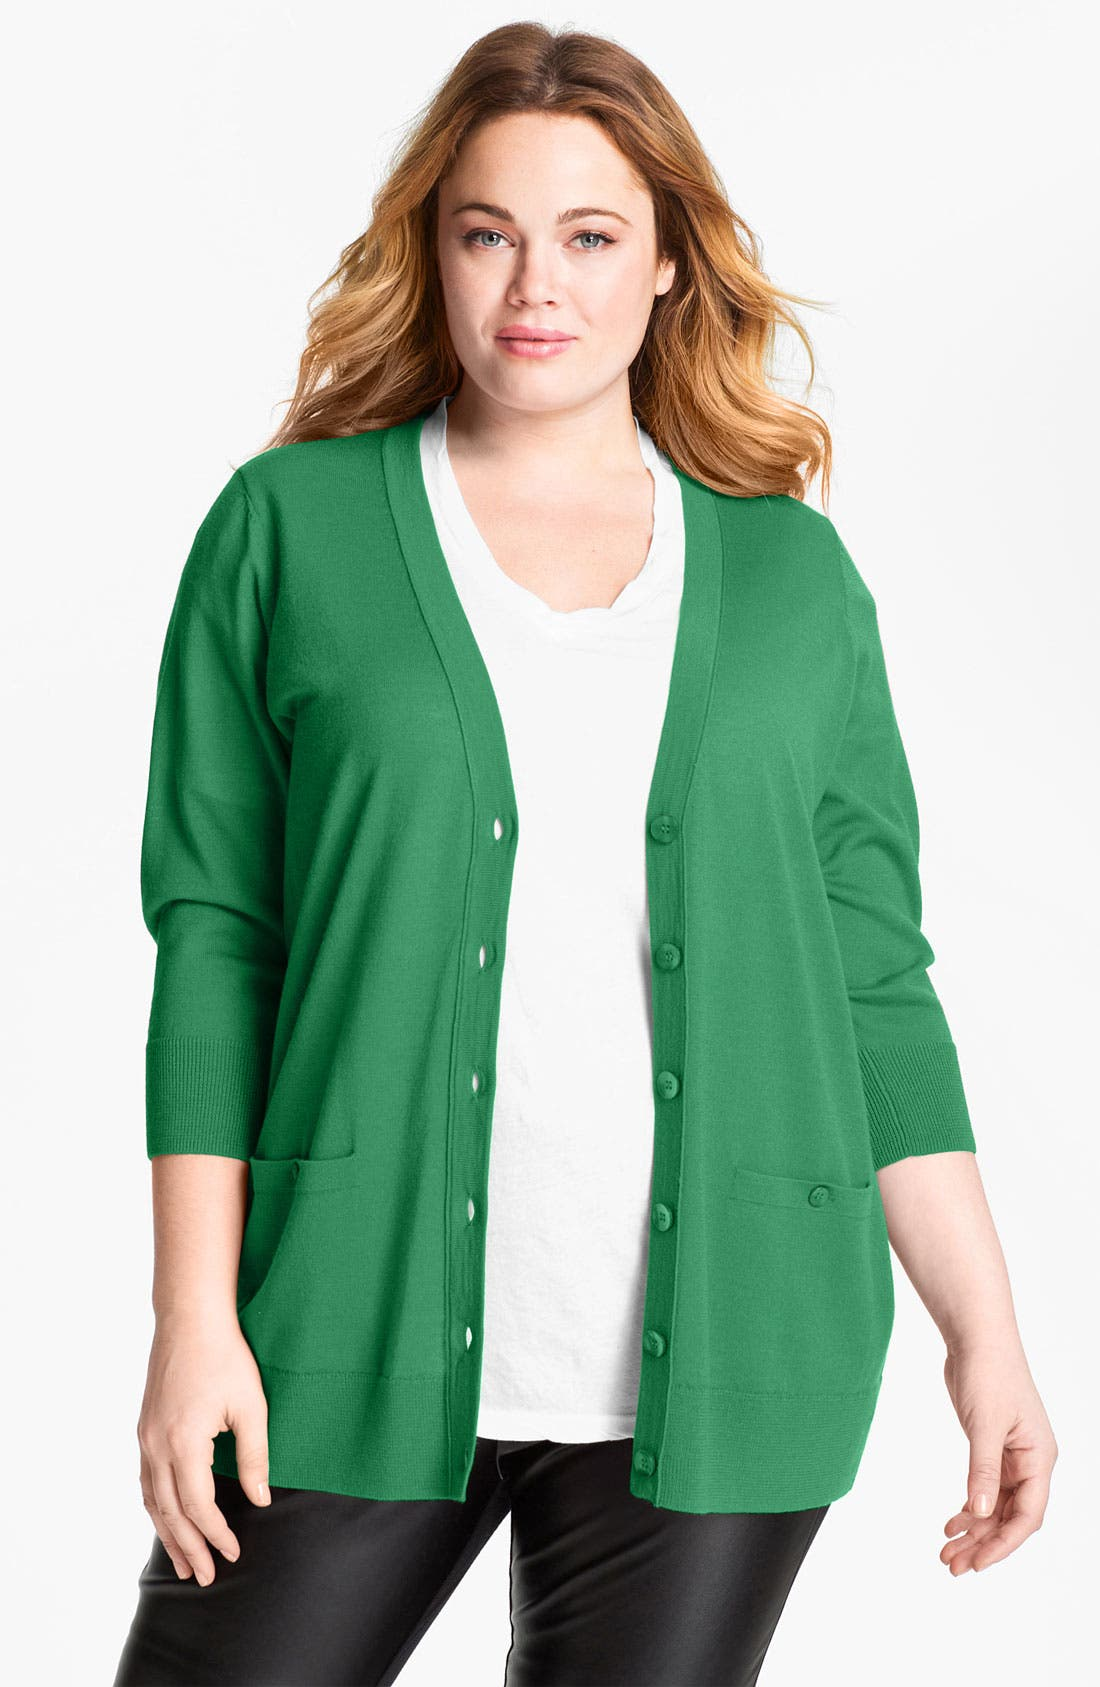 Alternate Image 1 Selected - Sejour 'Girlfriend' Three Quarter Sleeve Cardigan (Plus Size)